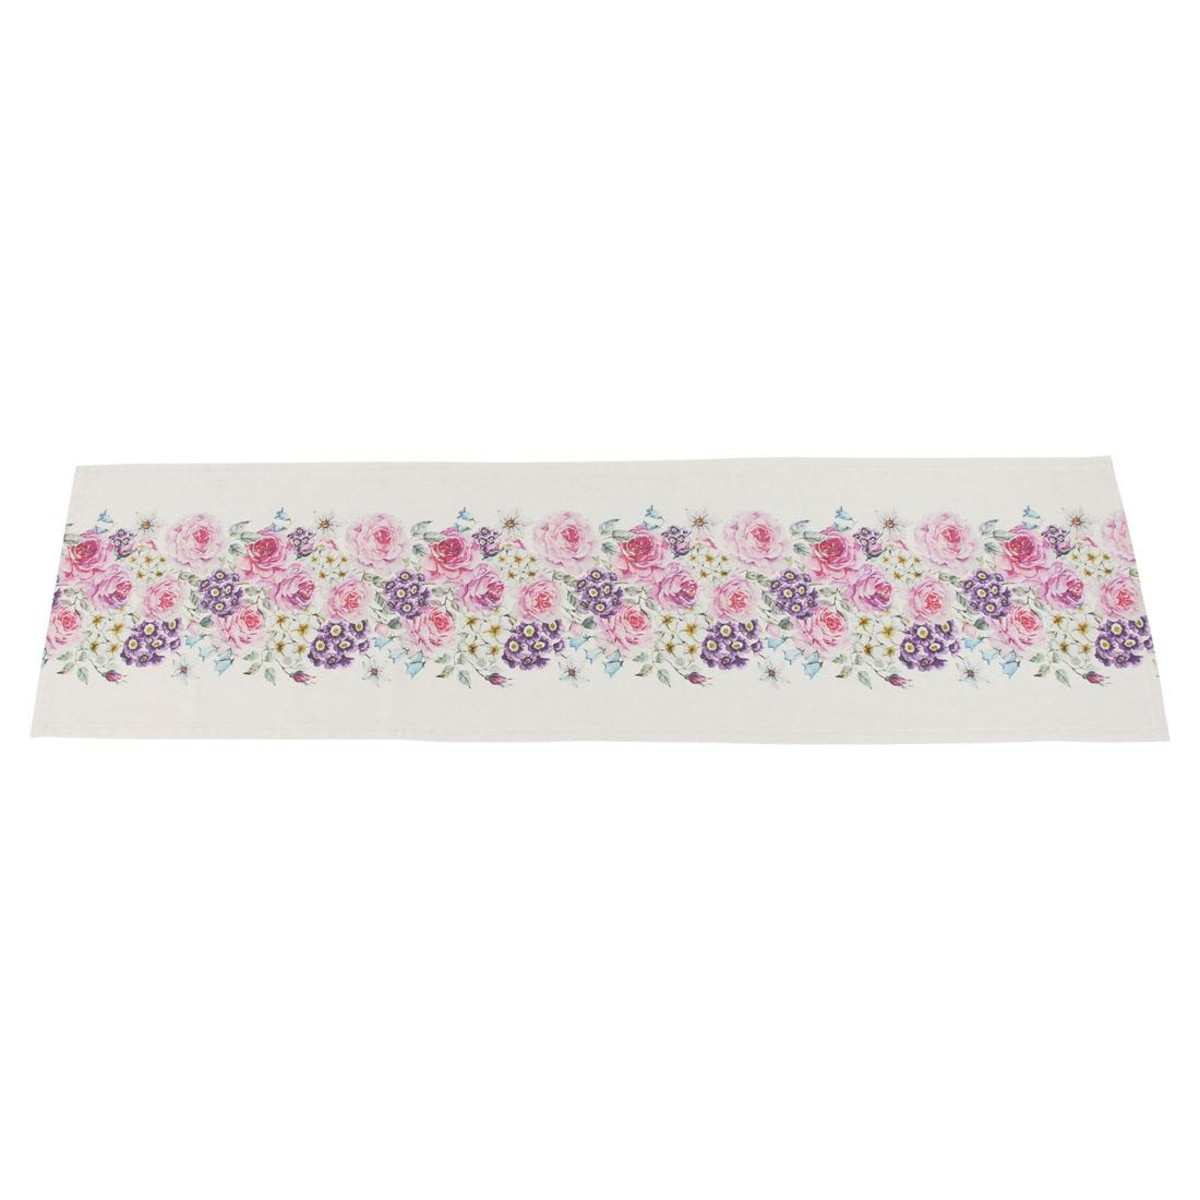 Дорожка на стол Хит-декор Букет цветов 07437 85х85 см